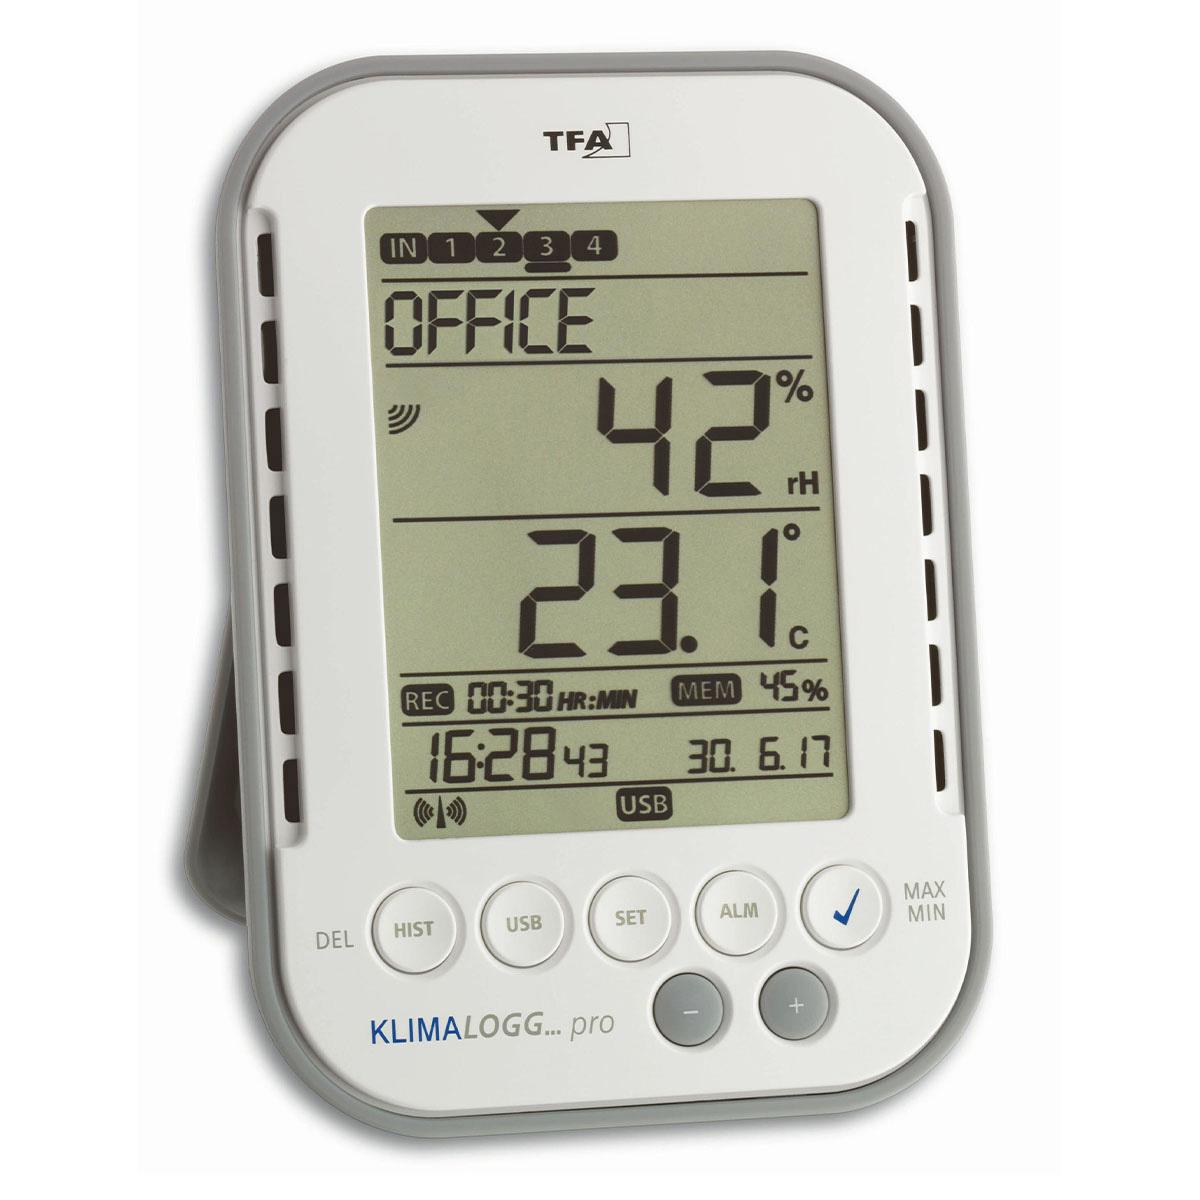 30-3039-it-profi-thermo-hygrometer-mit-datenlogger-funktion-klimalogg-pro-1200x1200px.jpg